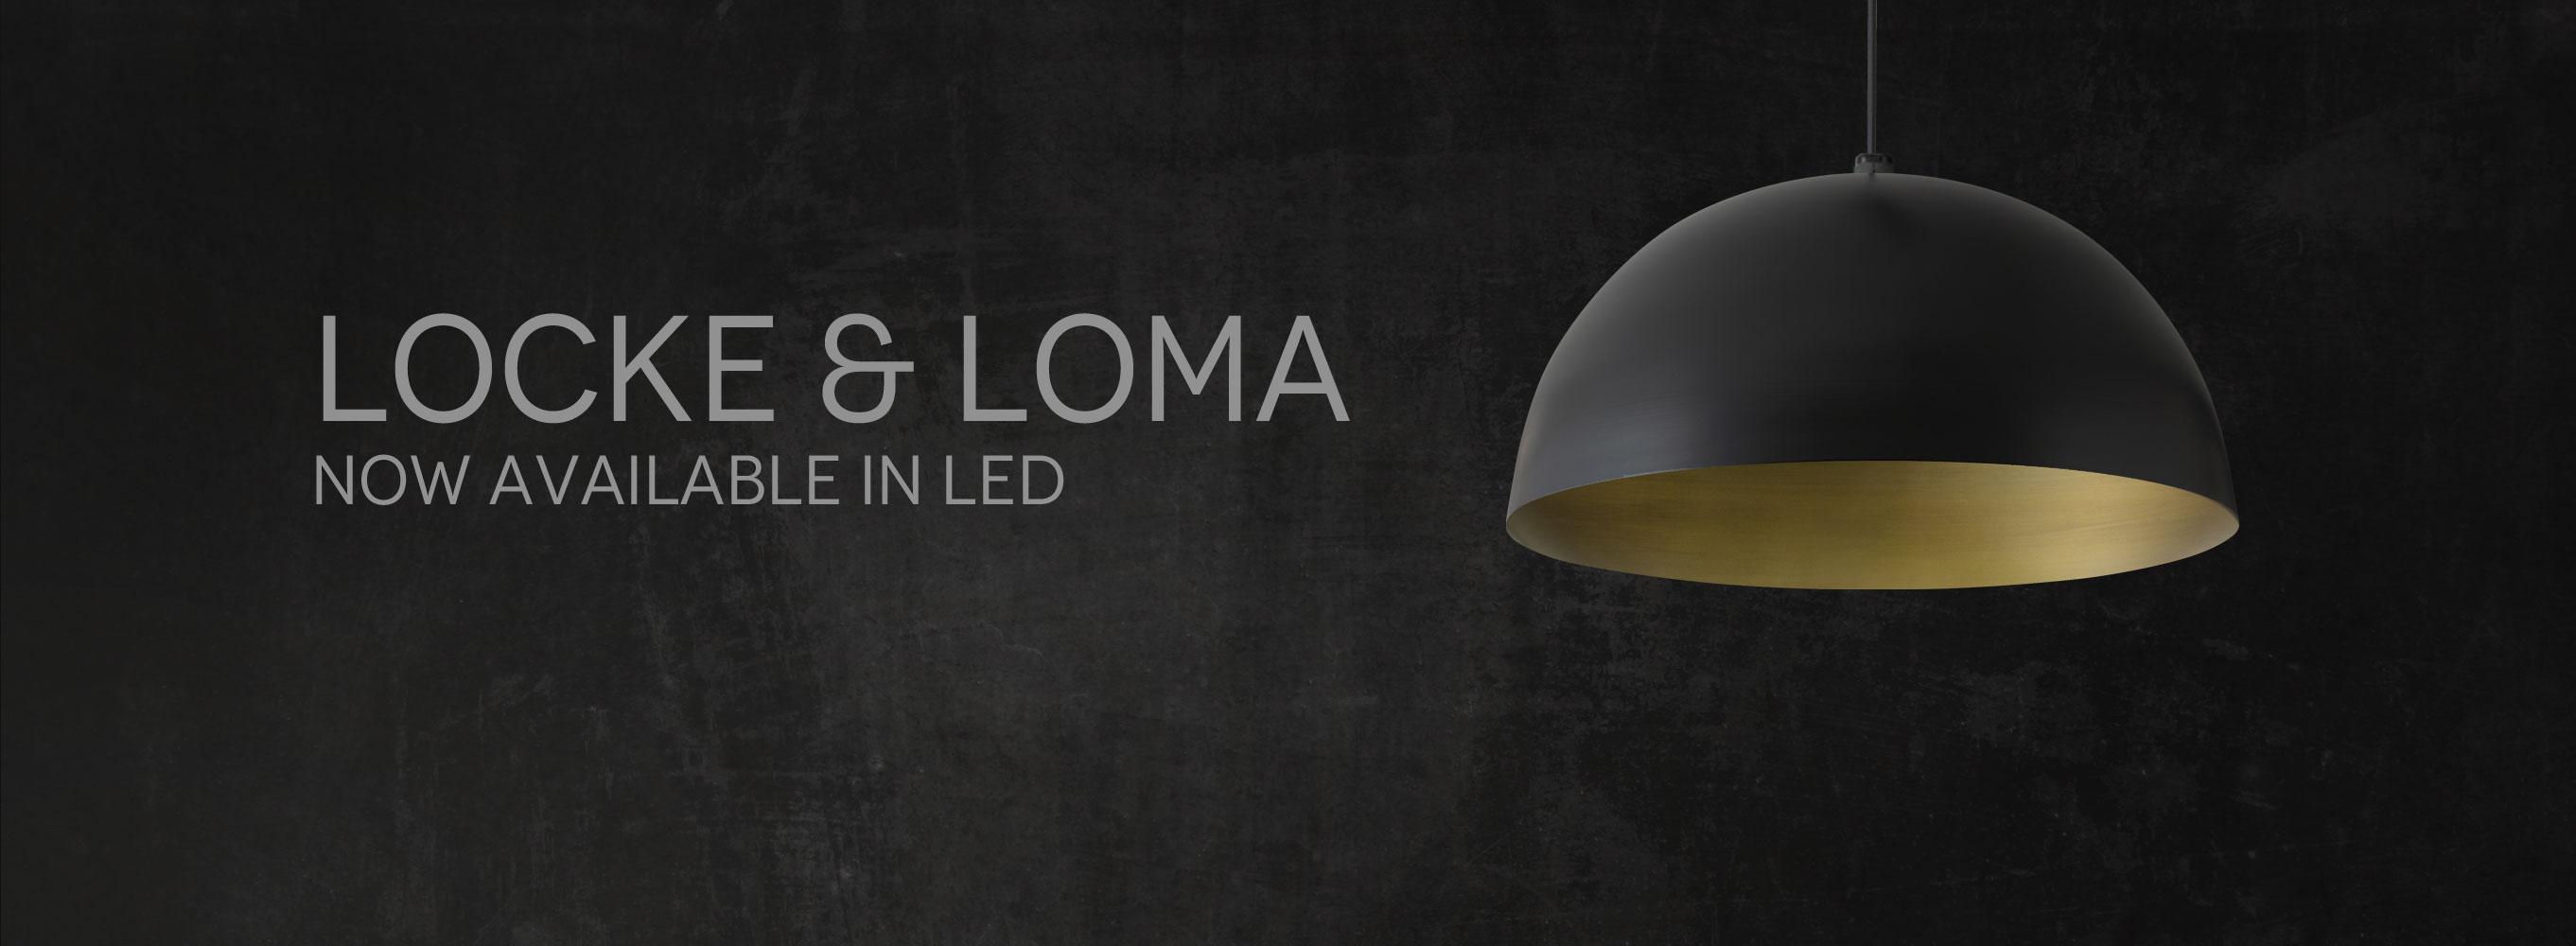 Locke & Loma LED